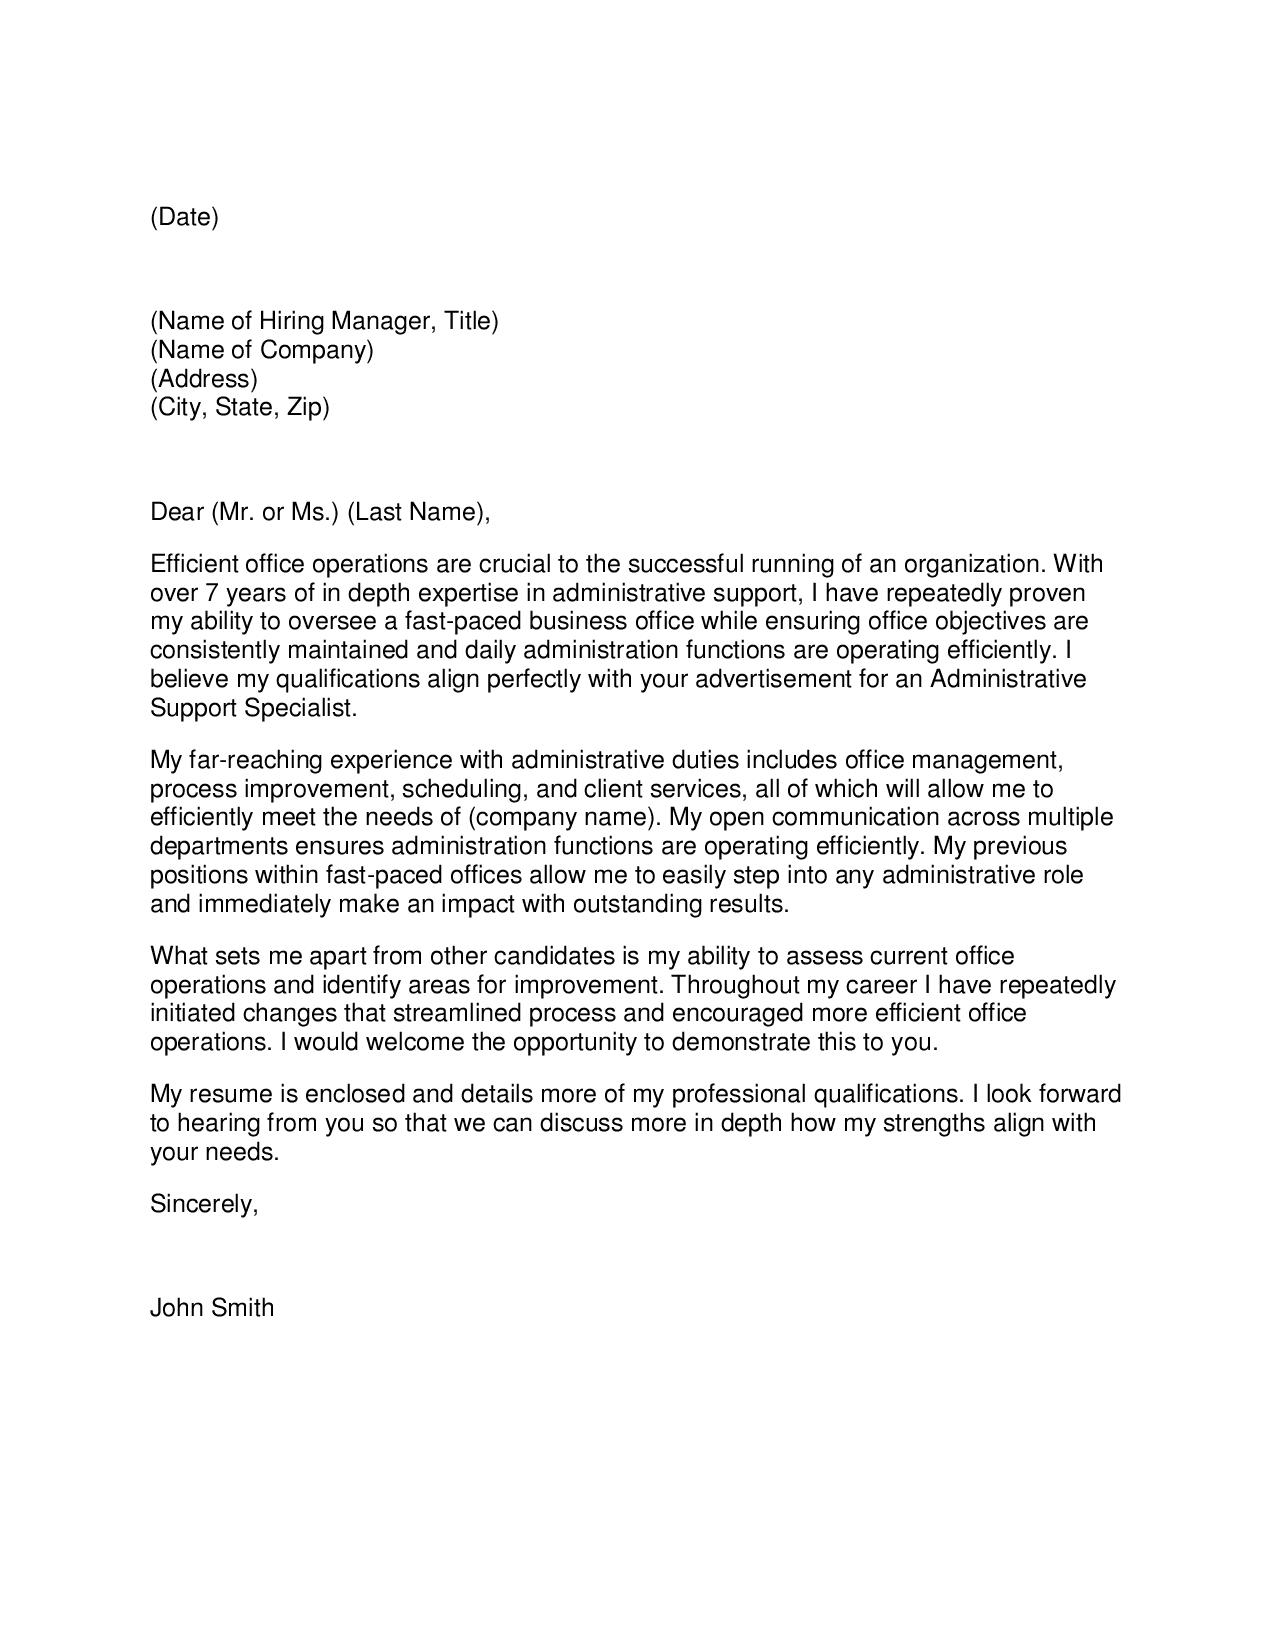 example resume  sample resume peer support specialist